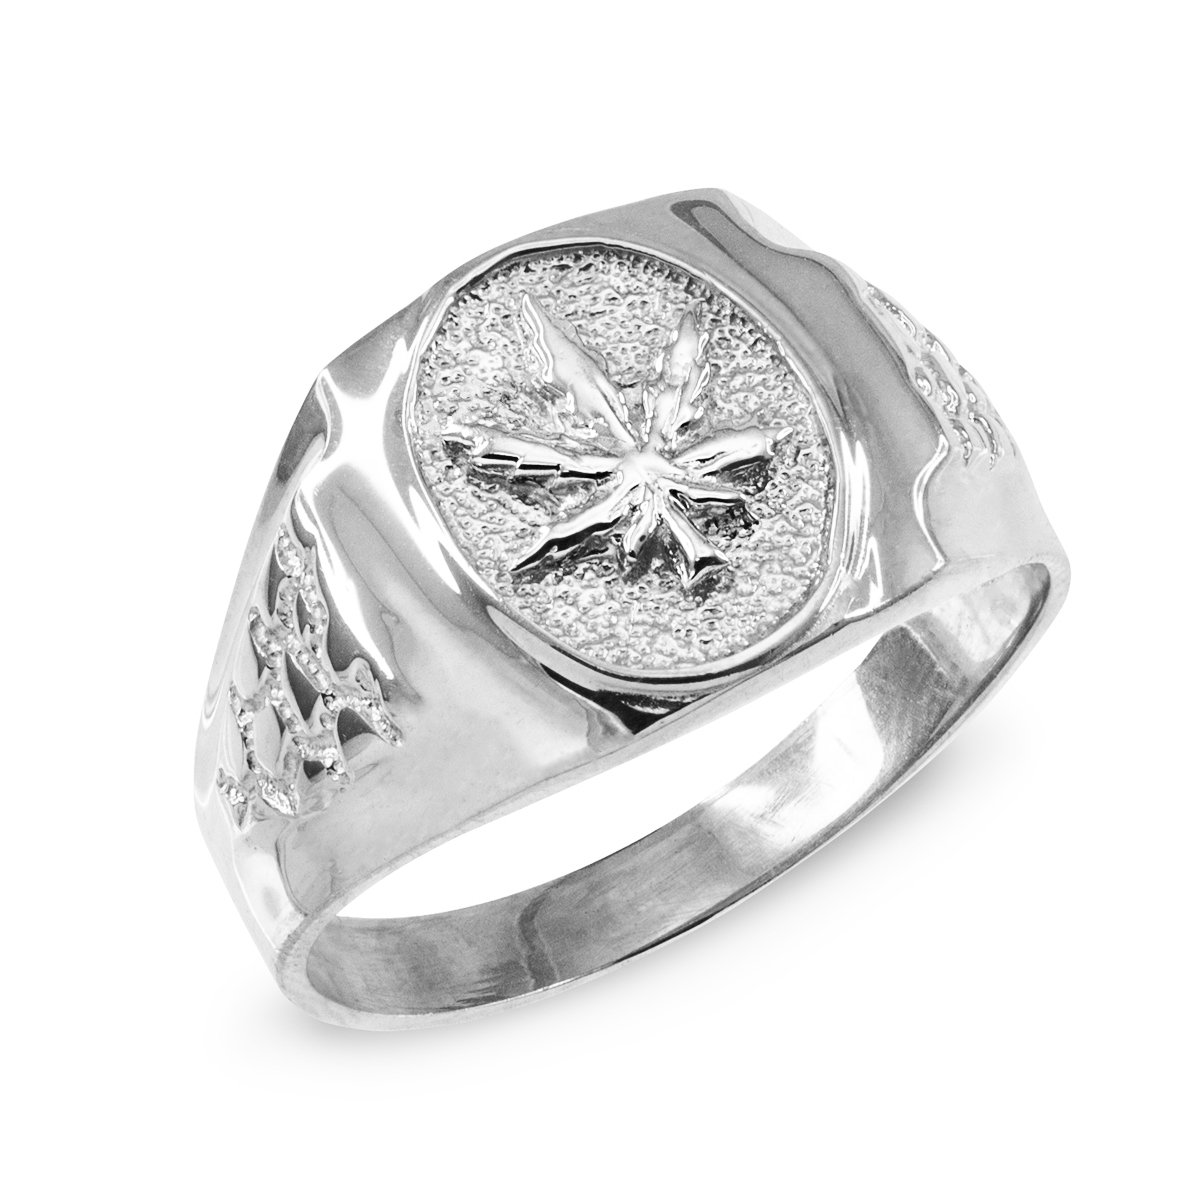 Men's High Polish 925 Sterling Silver 420 Pot Ganja Weed Cannabis Marijuana Leaf Ring (Size 9.5)